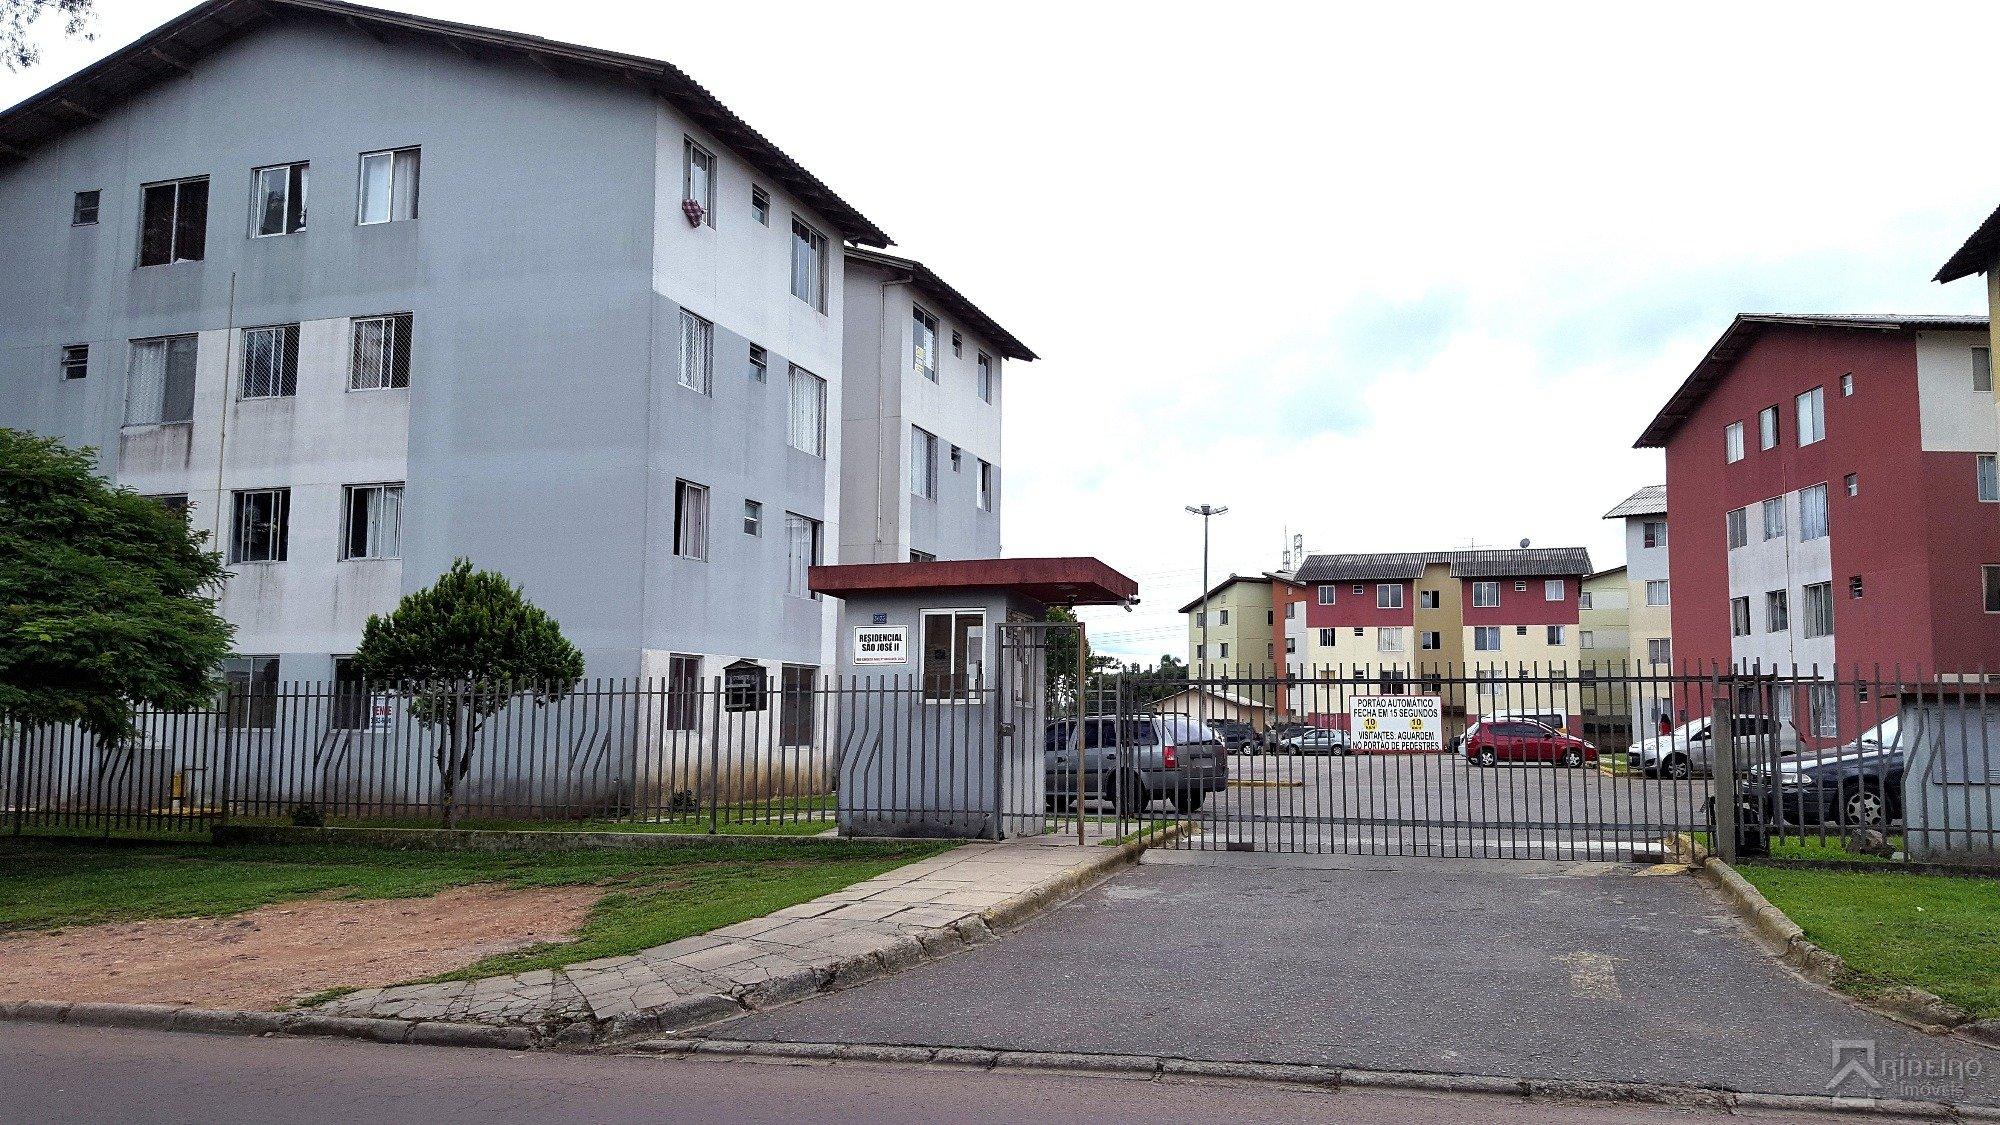 REF. 7382 -  Sao Jose Dos Pinhais - Rua  Anneliese Gellert Krigsner, 3033 - Apto 04 - Bl C